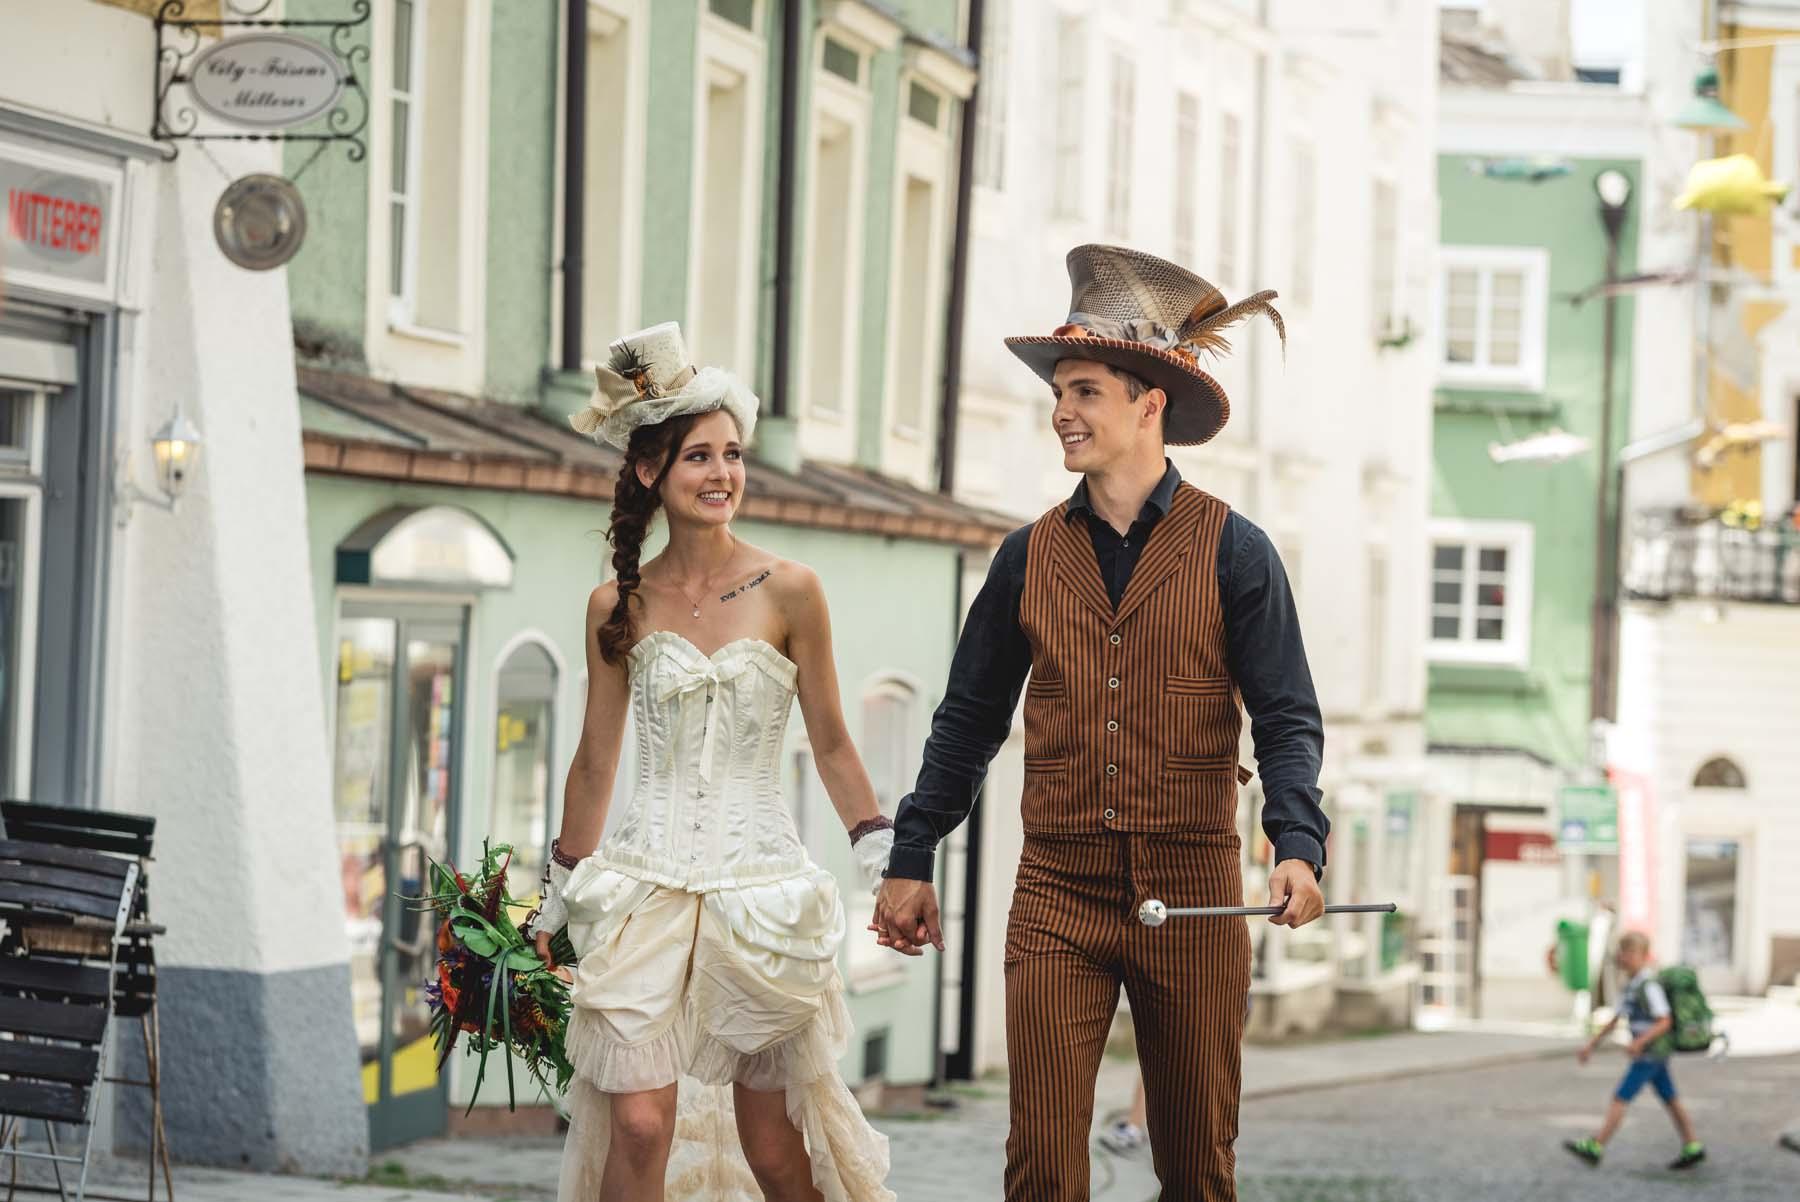 Willy Wonka inspired Wedding in Gmunden